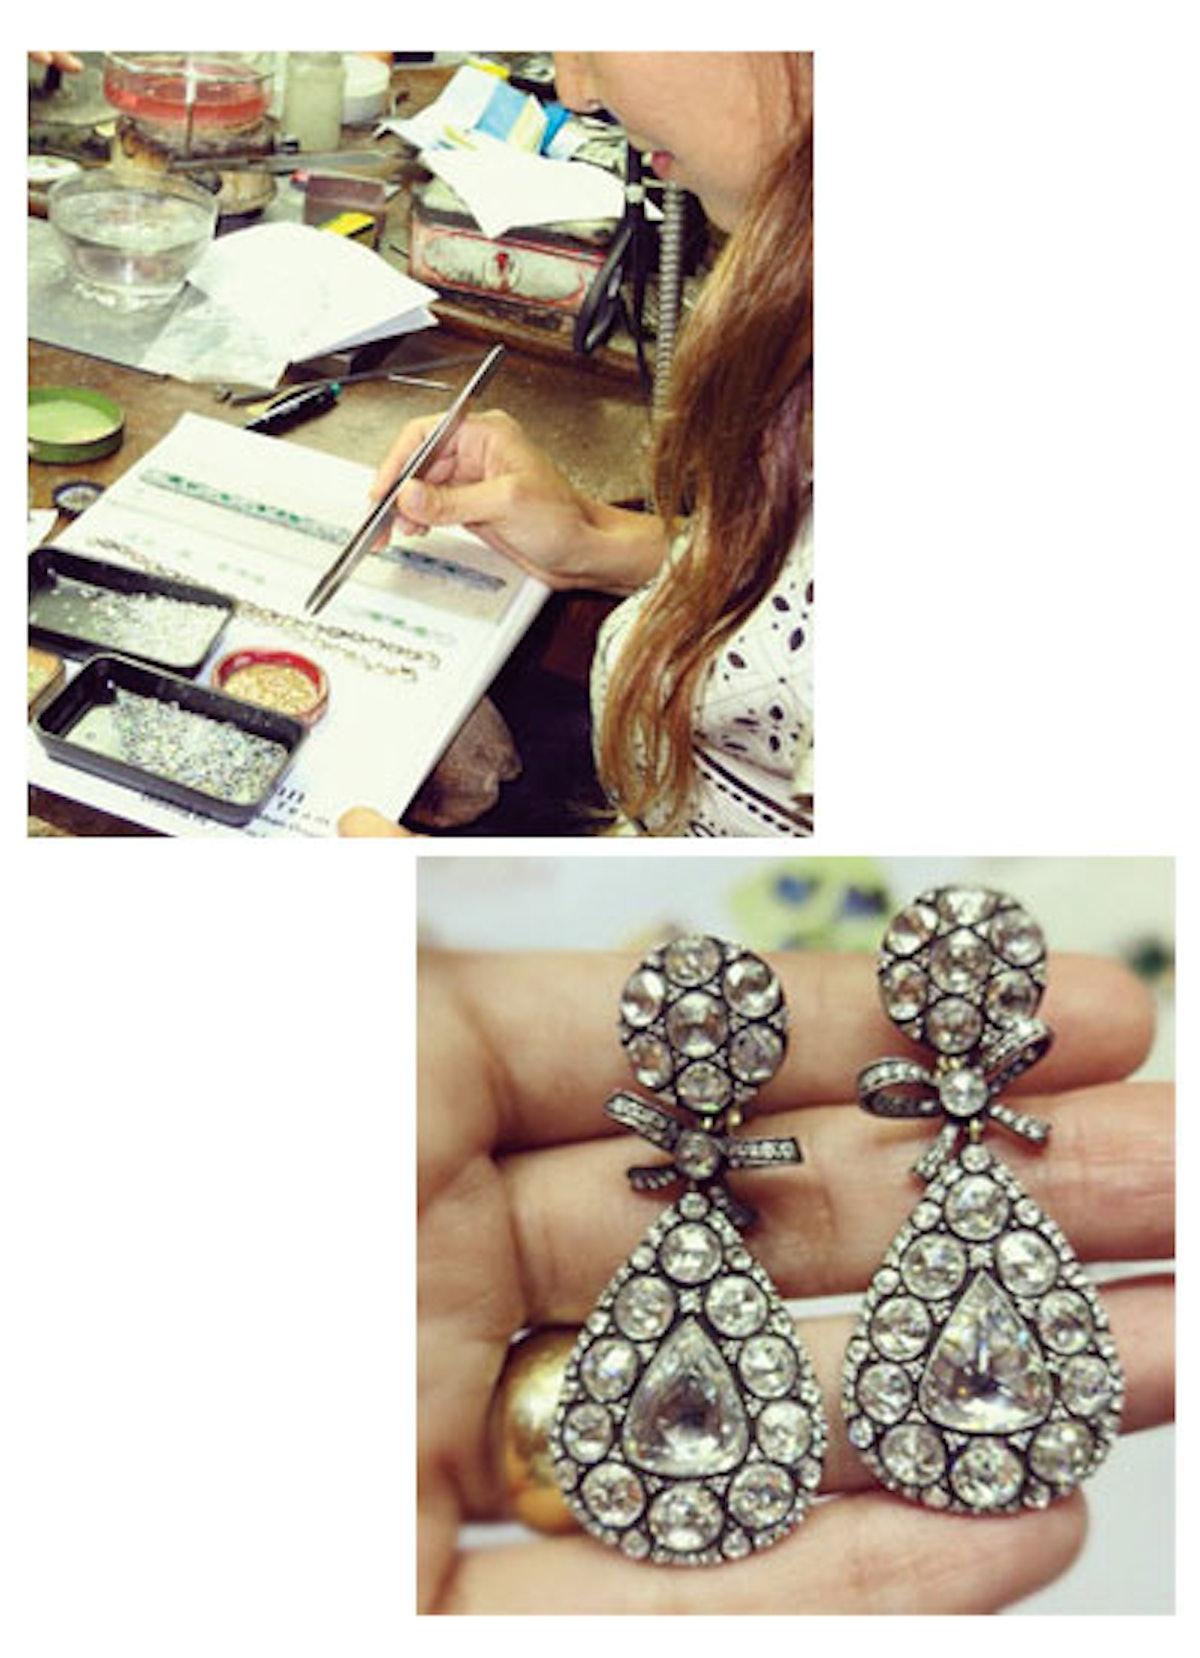 acss-claudia-jewelry-nov-2012-06-v.jpg